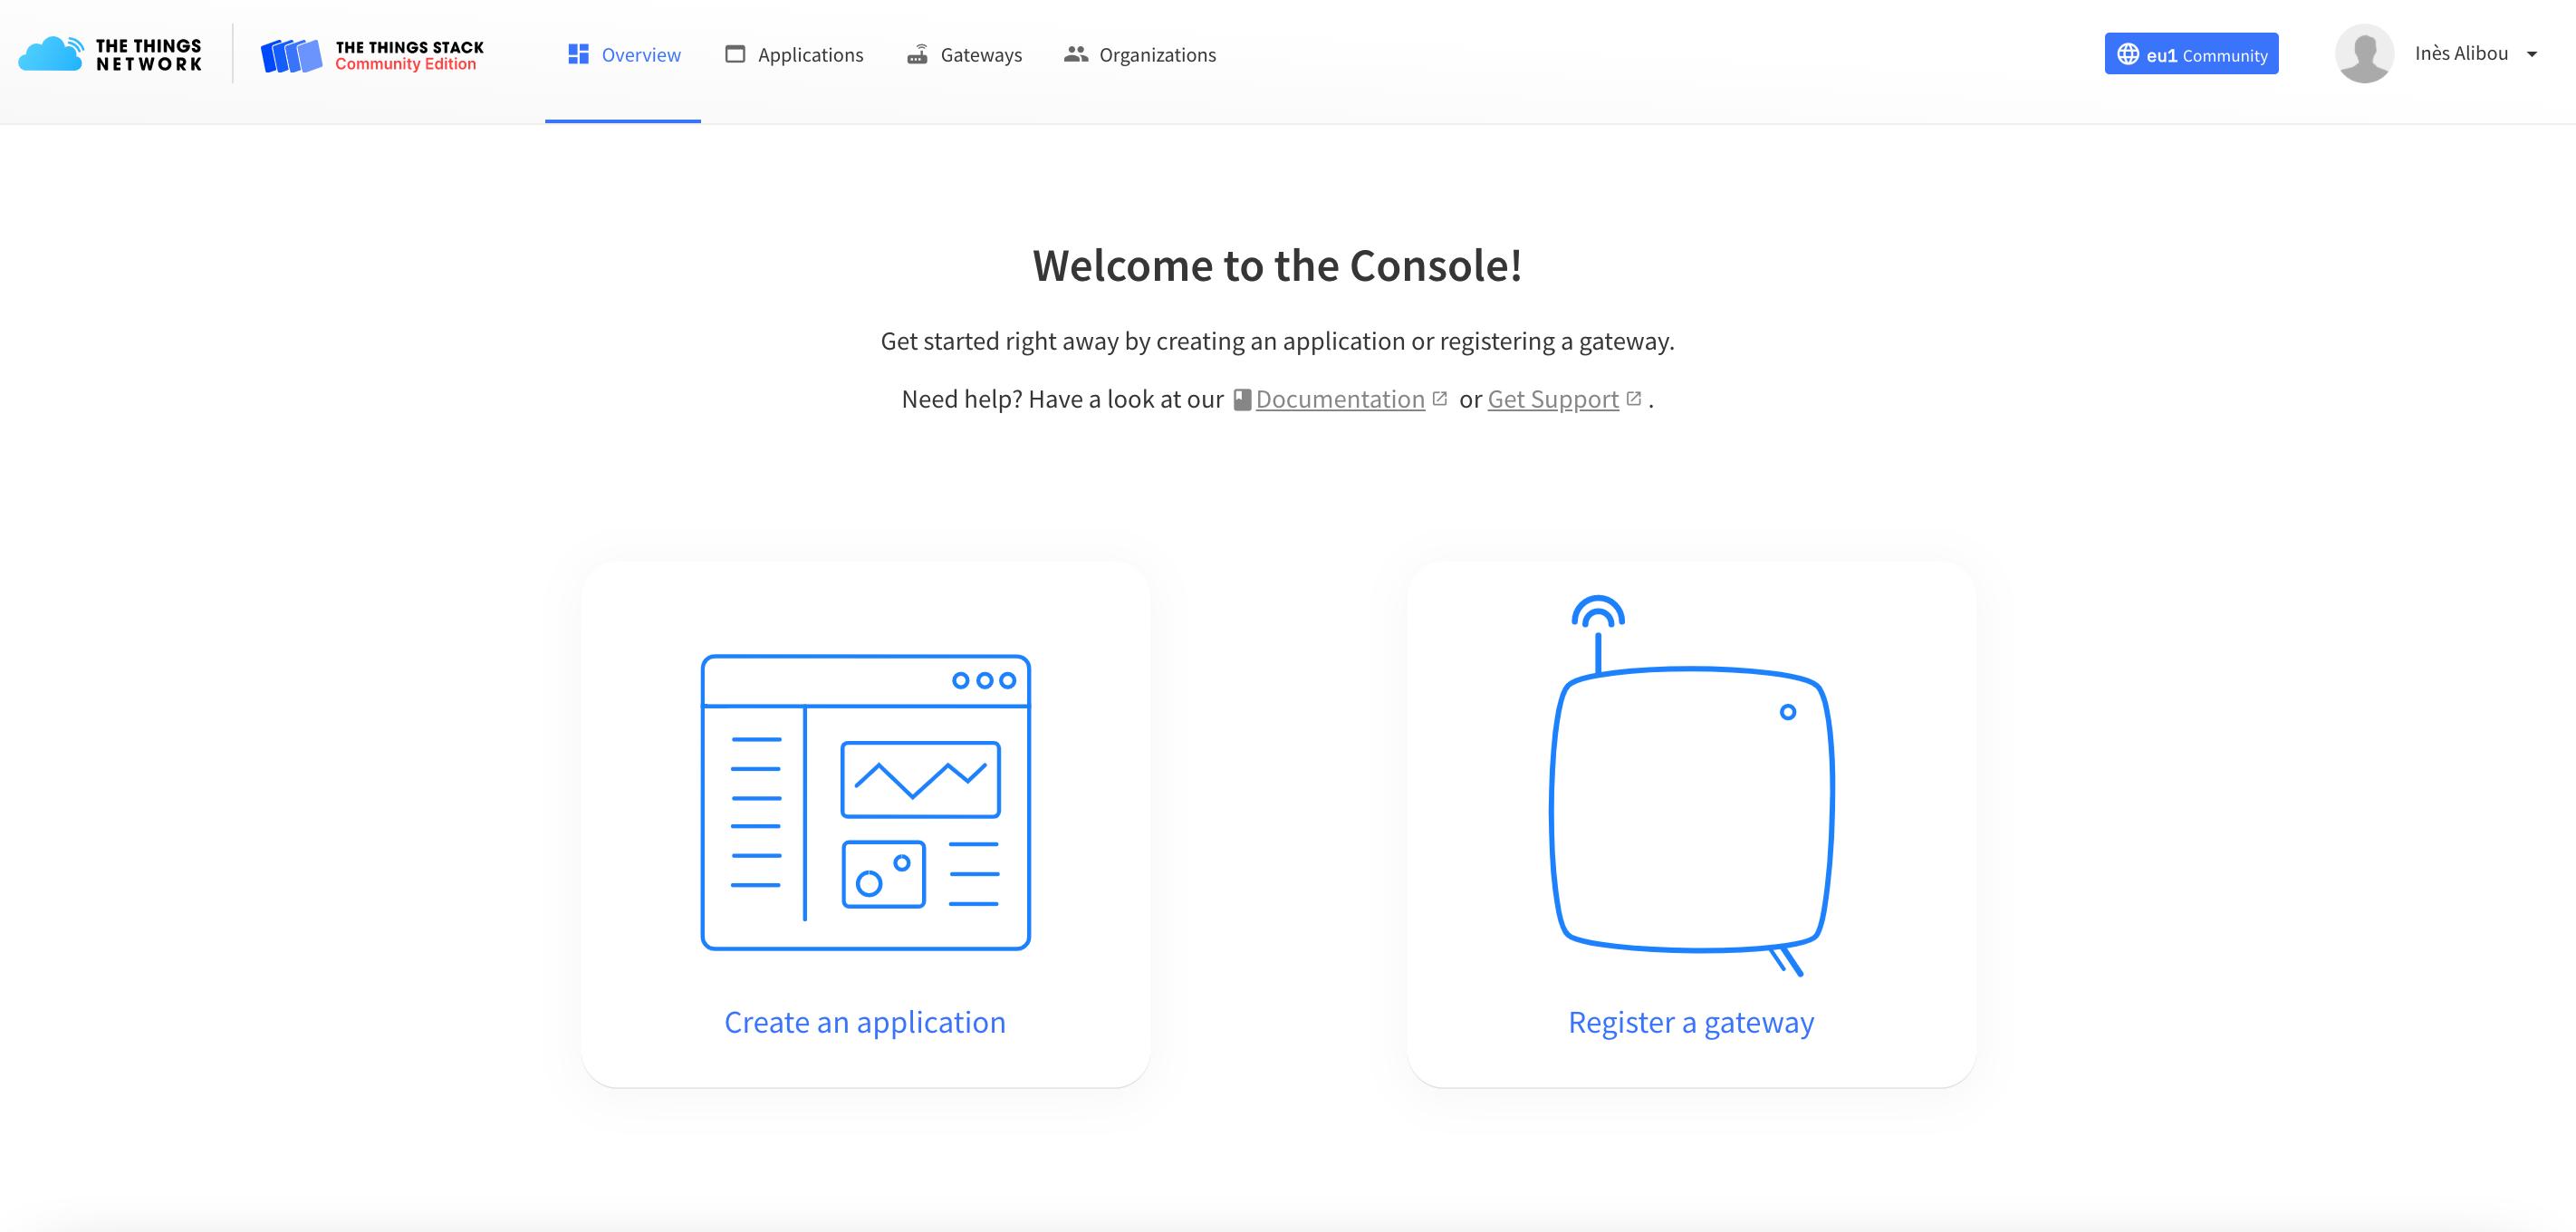 TTS Community Edition interface